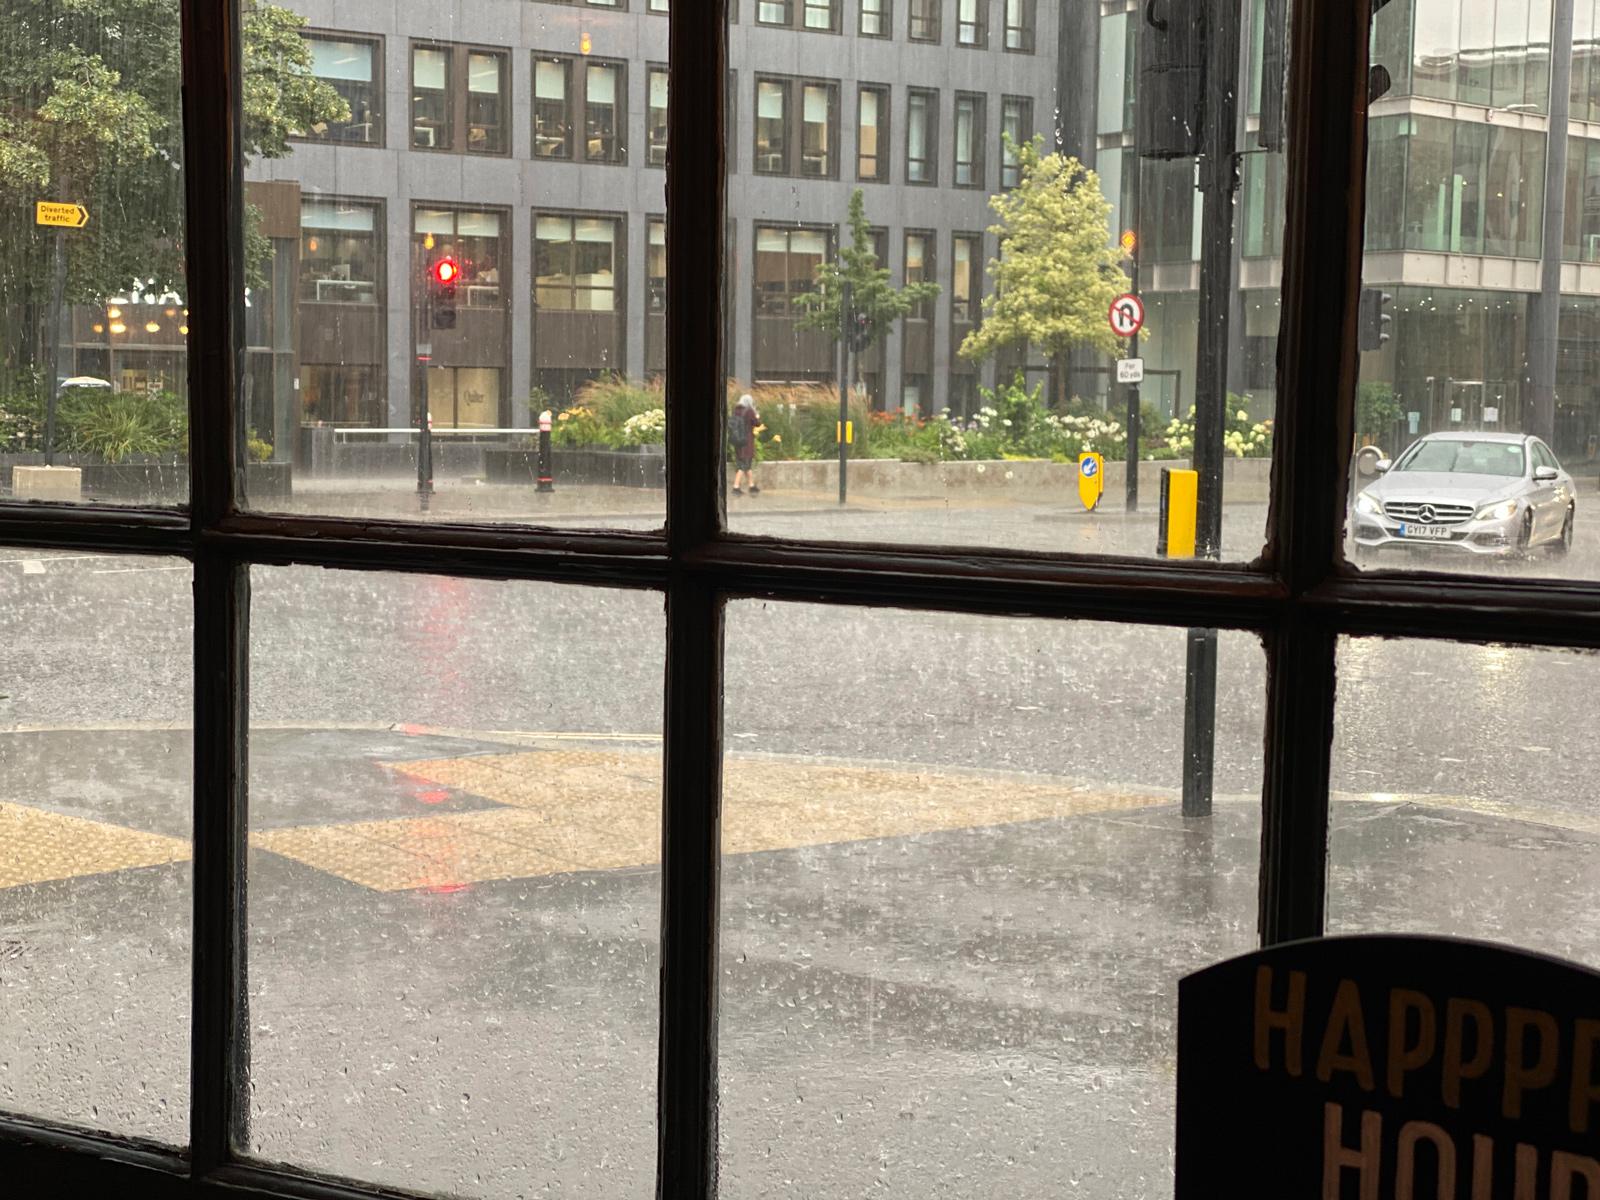 Heavy rain falling on the road outside The Sea Horse.